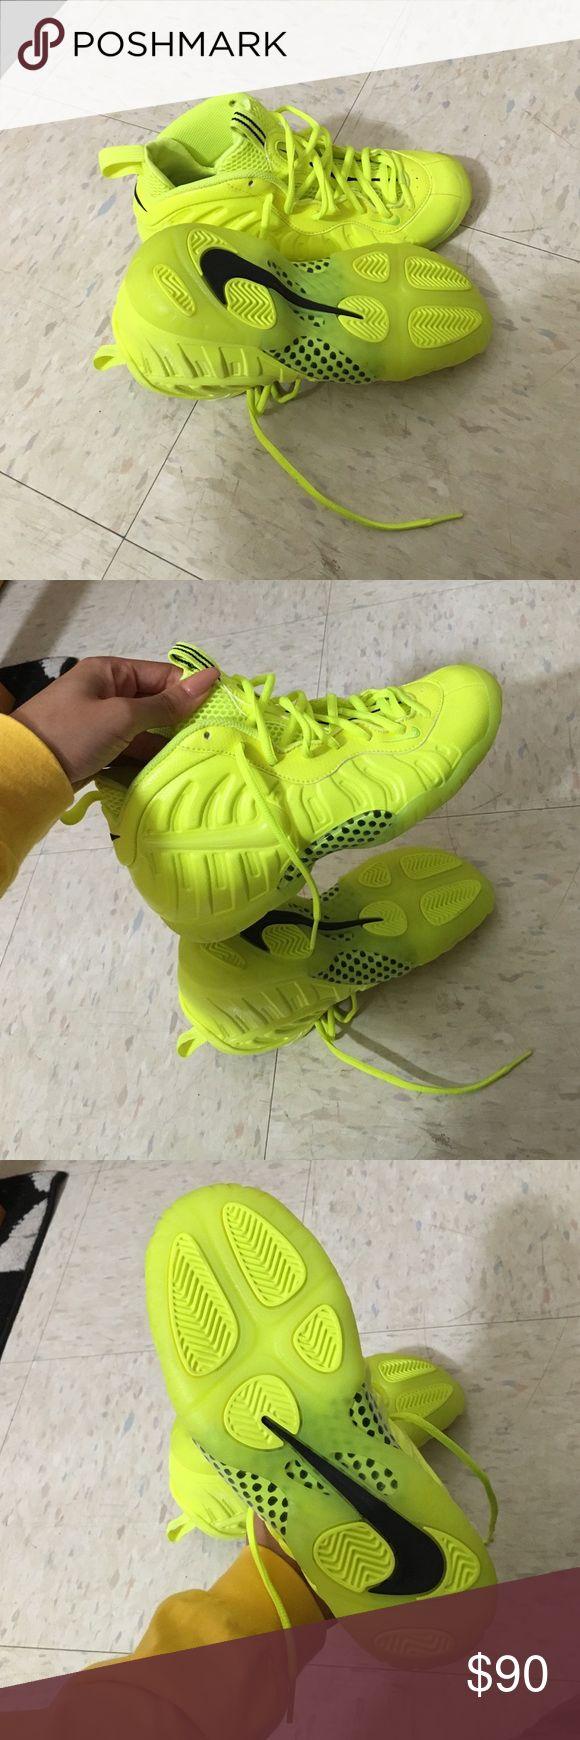 Neon Volt (Yellow/Green) Foamposite Never worn Nike Shoes Sneakers